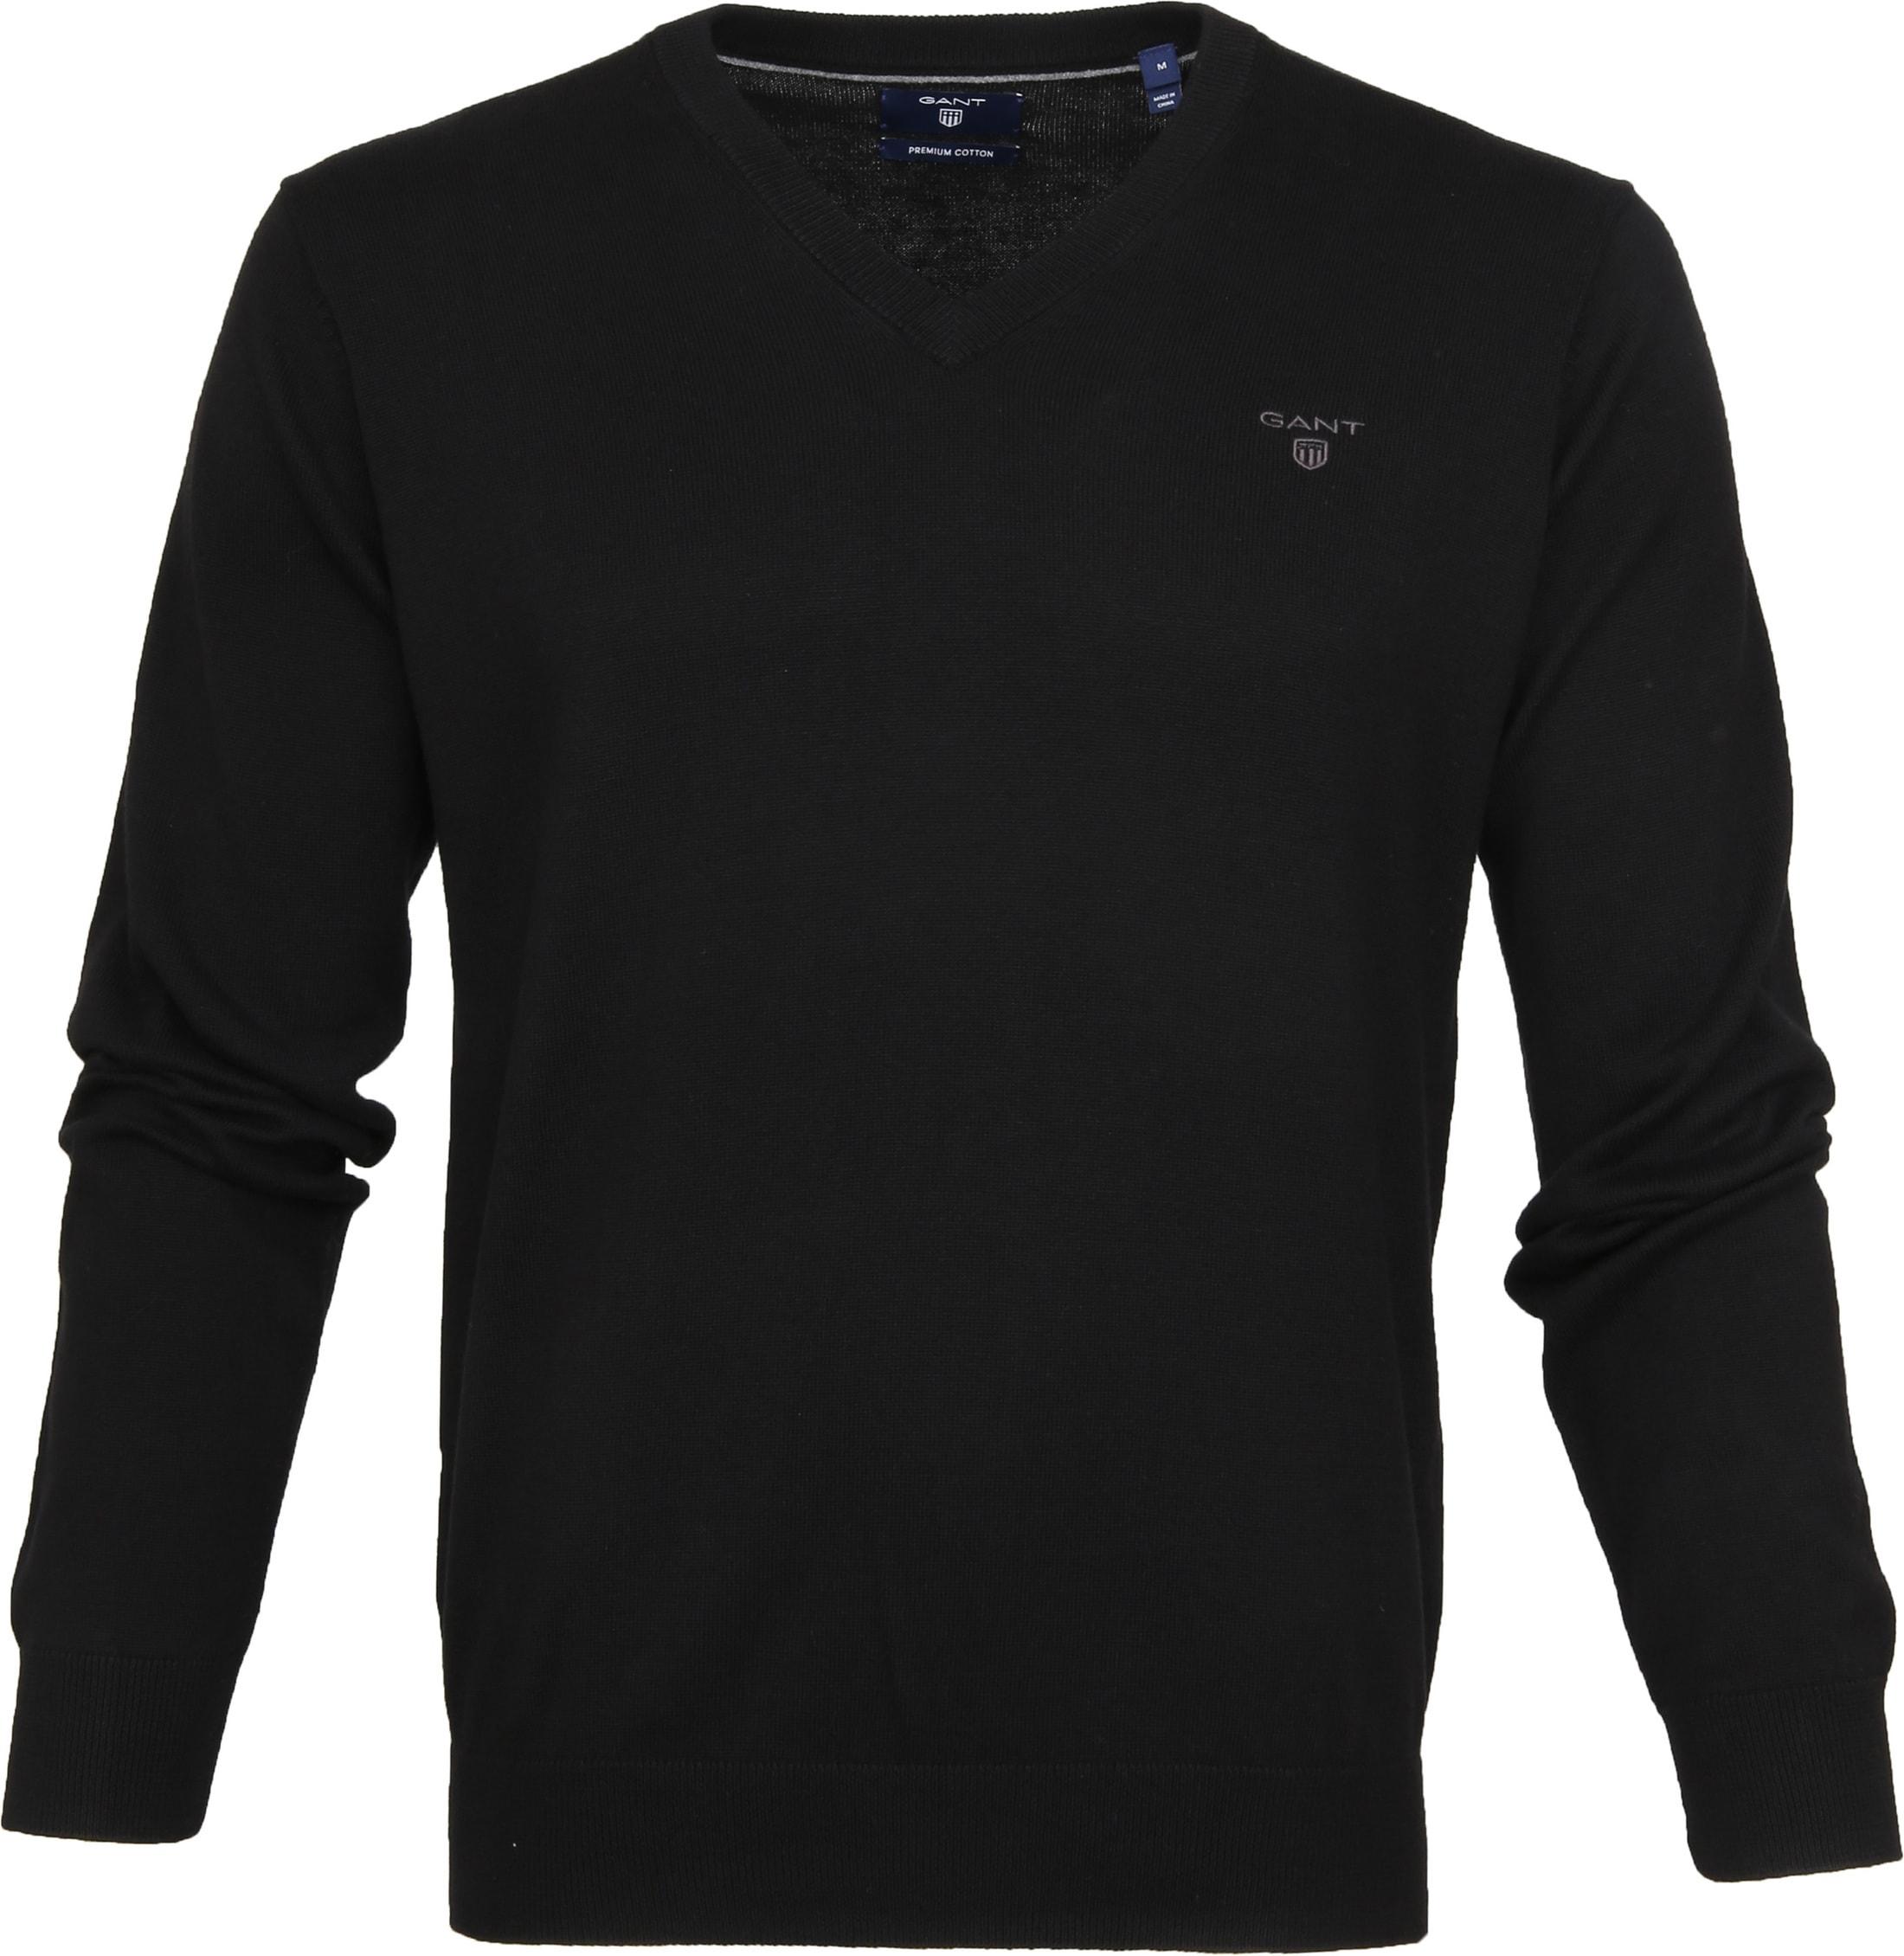 Gant Pullover Premium V-Hals Zwart foto 0